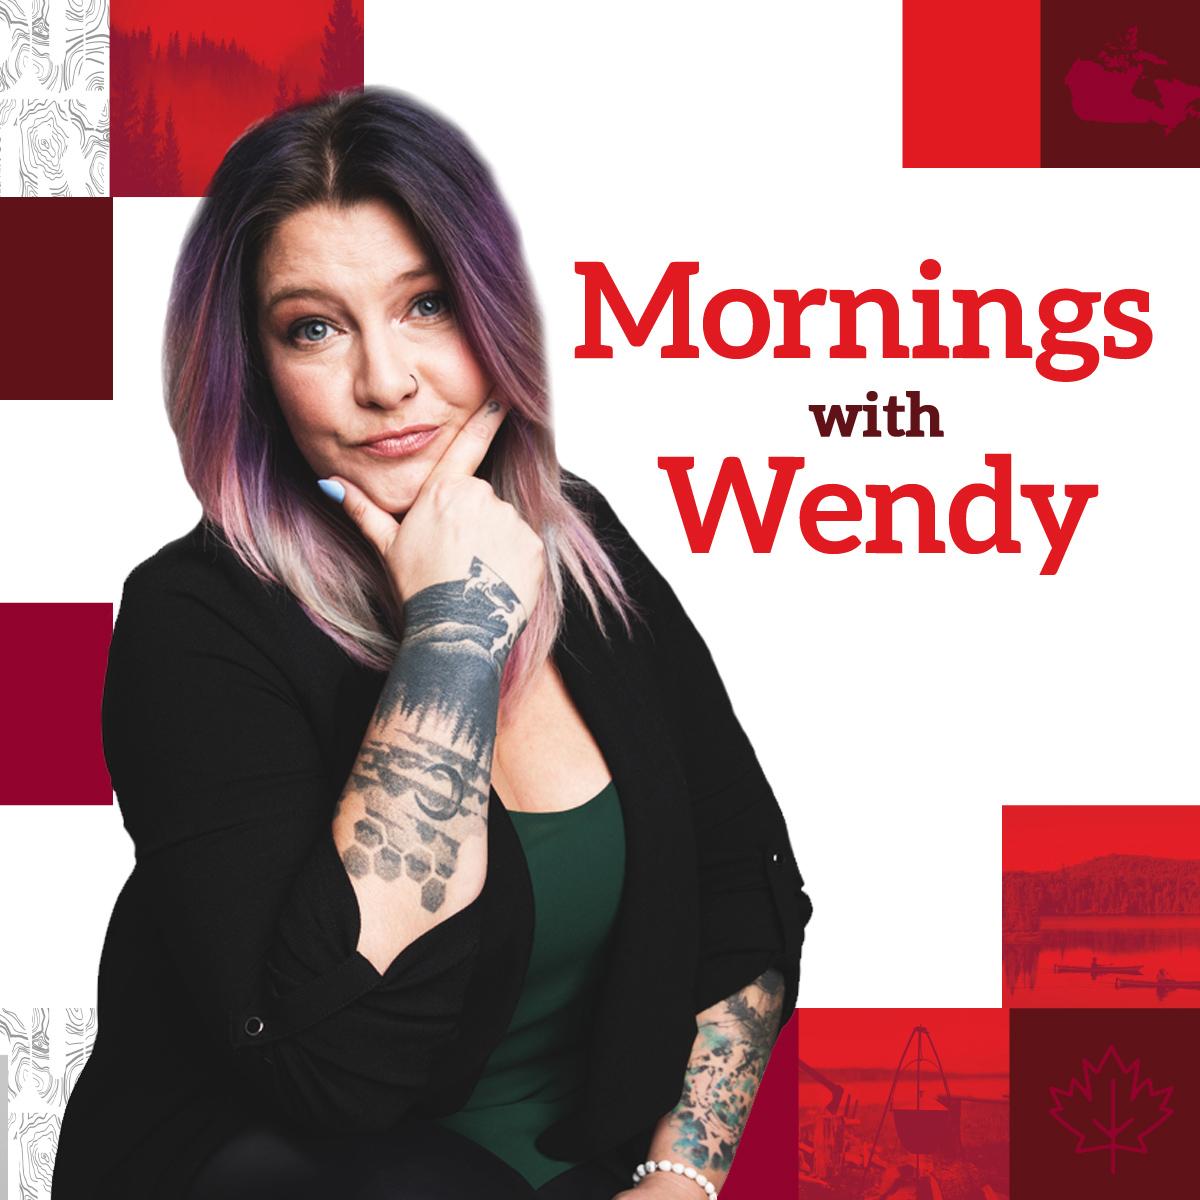 Wendy1200x1200 web